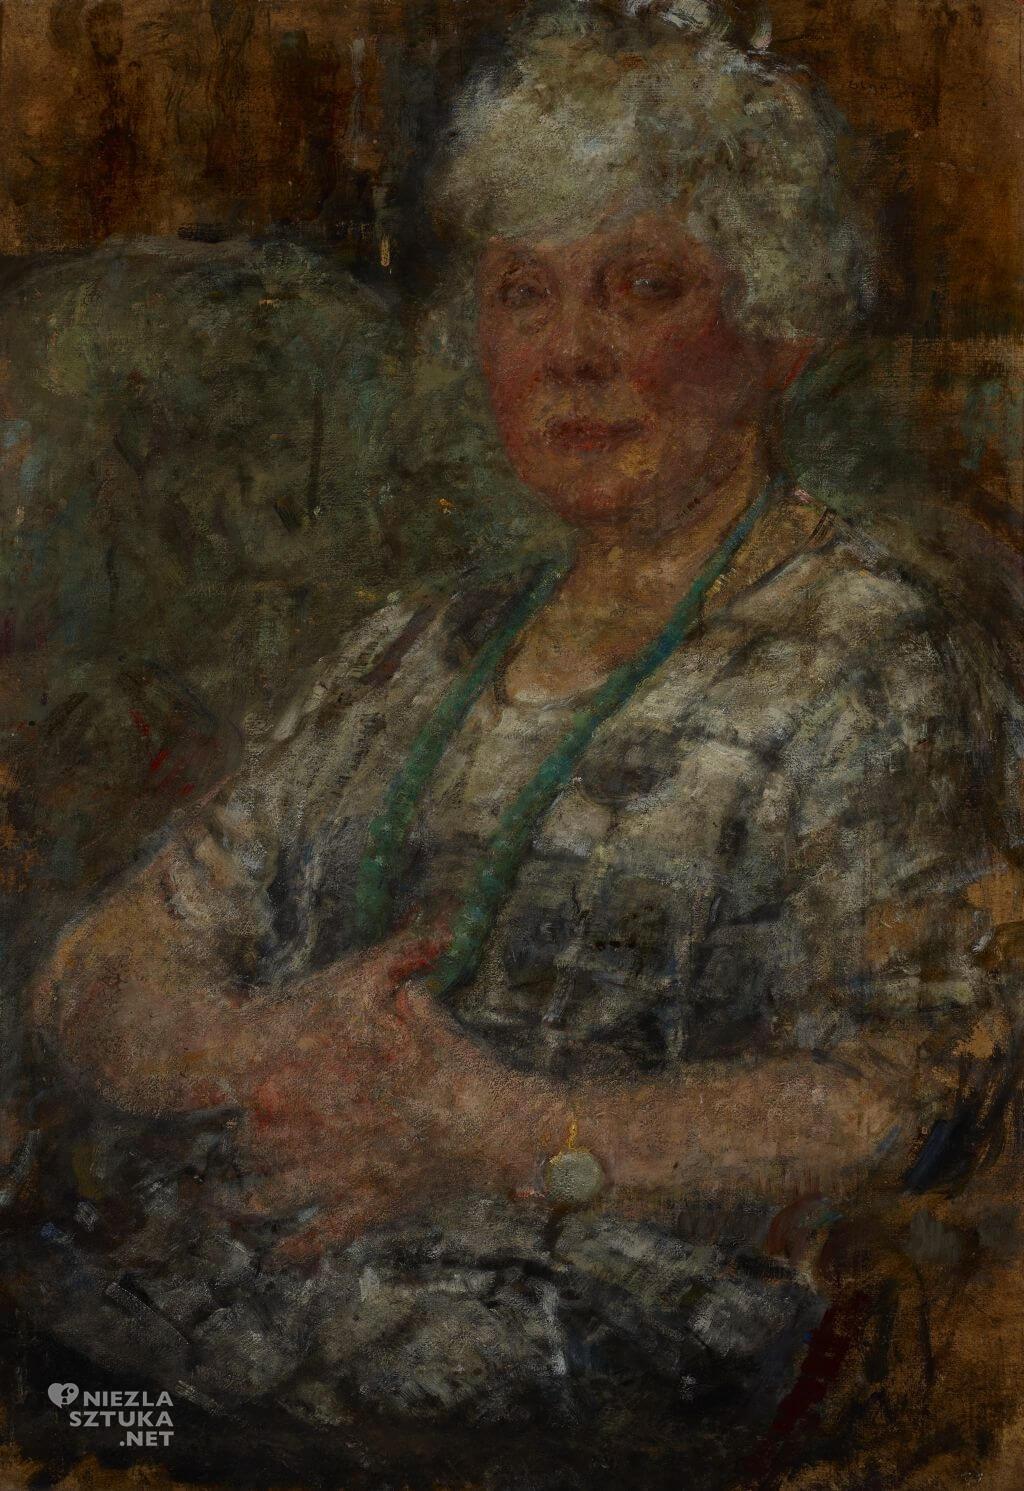 Olga Boznańska, Portret M. Thomasson, Portret malarki Pani Thomasson, sztuka polska, Niezła sztuka